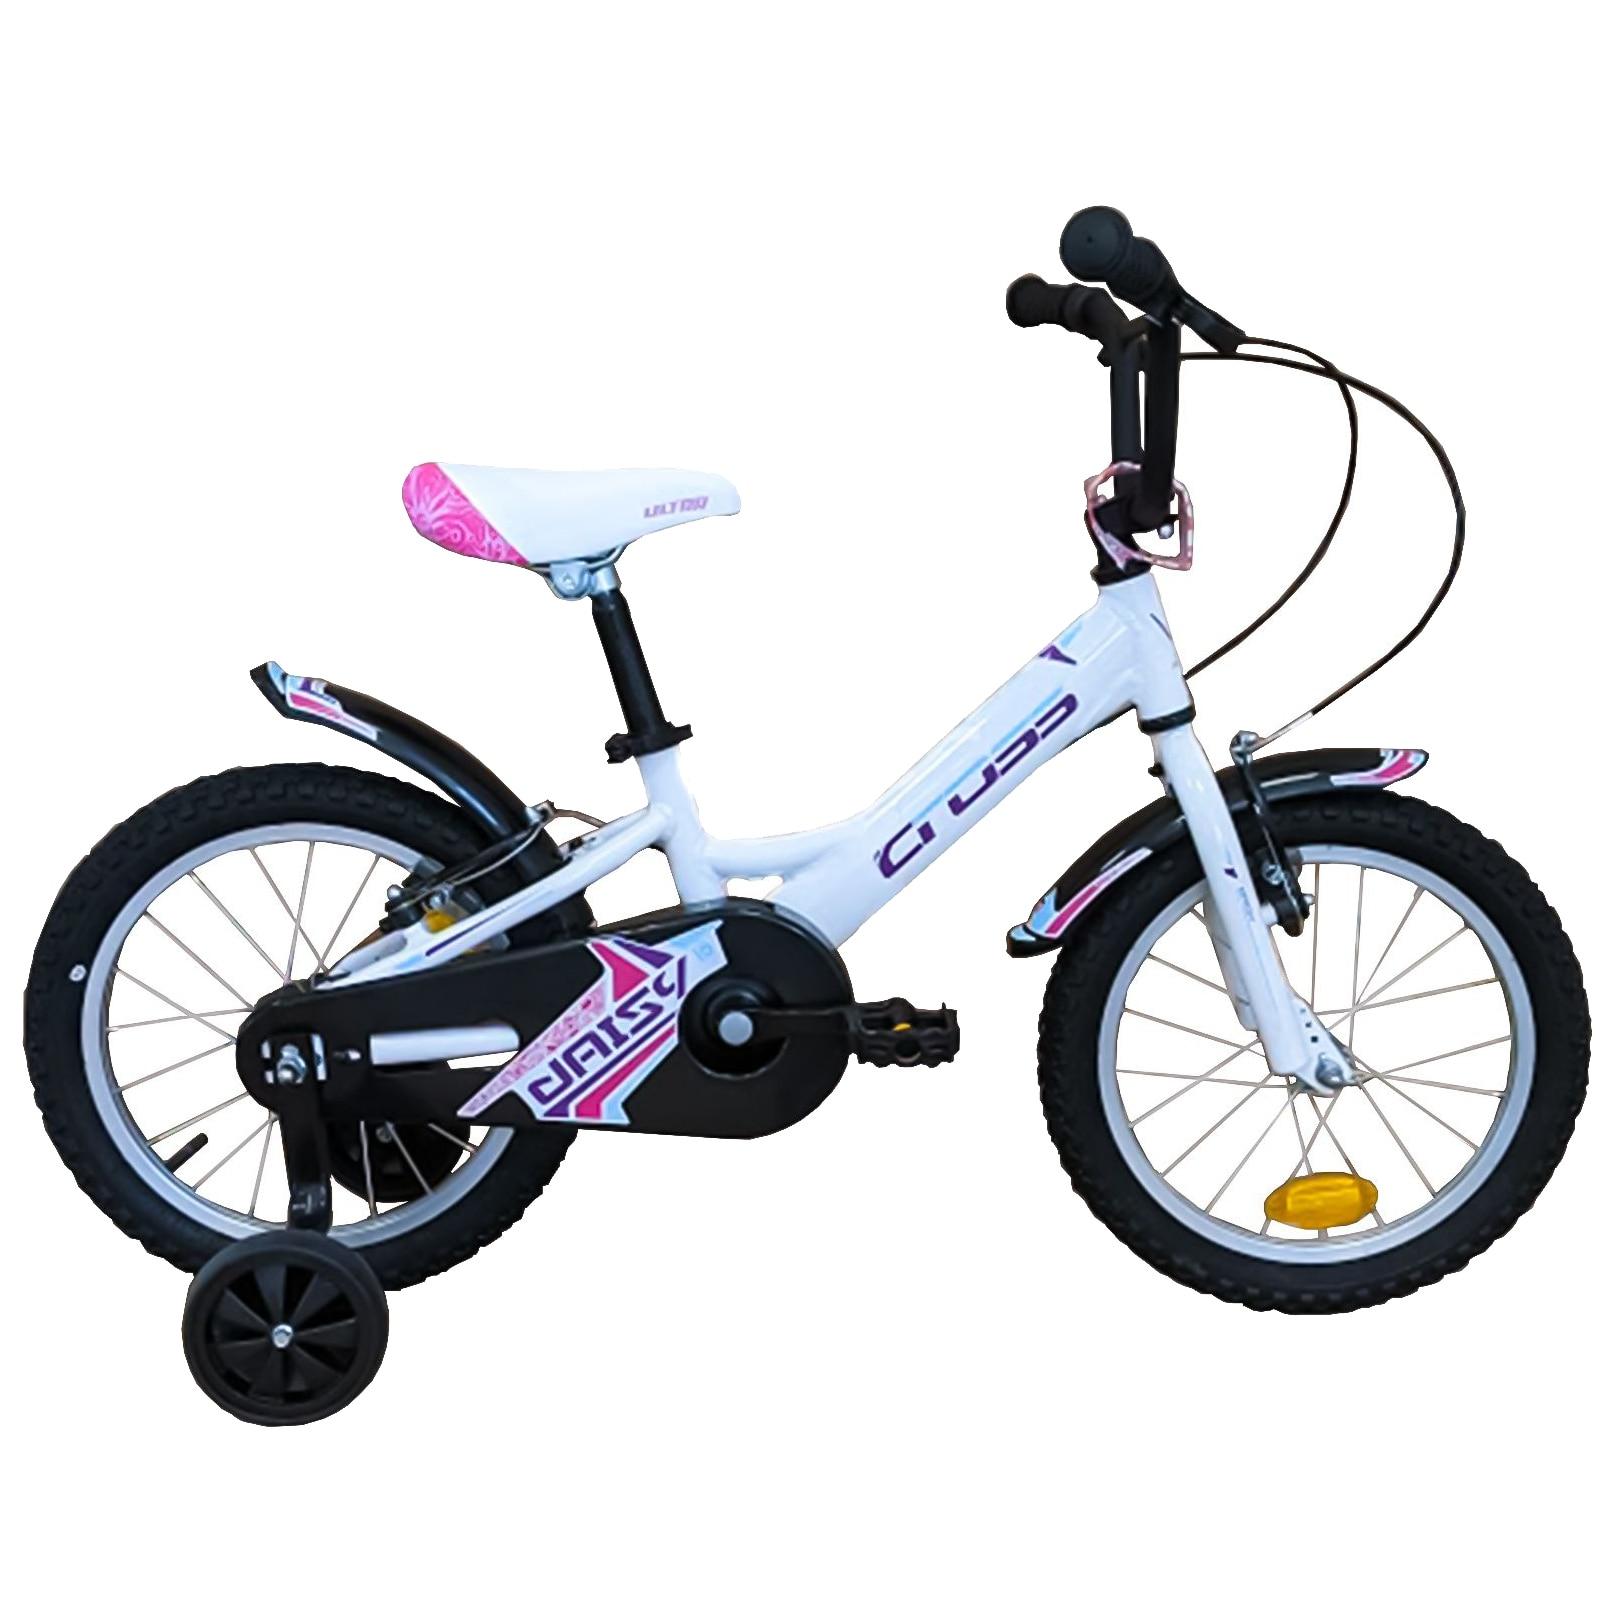 "Fotografie Bicicleta Cross Daisy 16"", Aluminium"